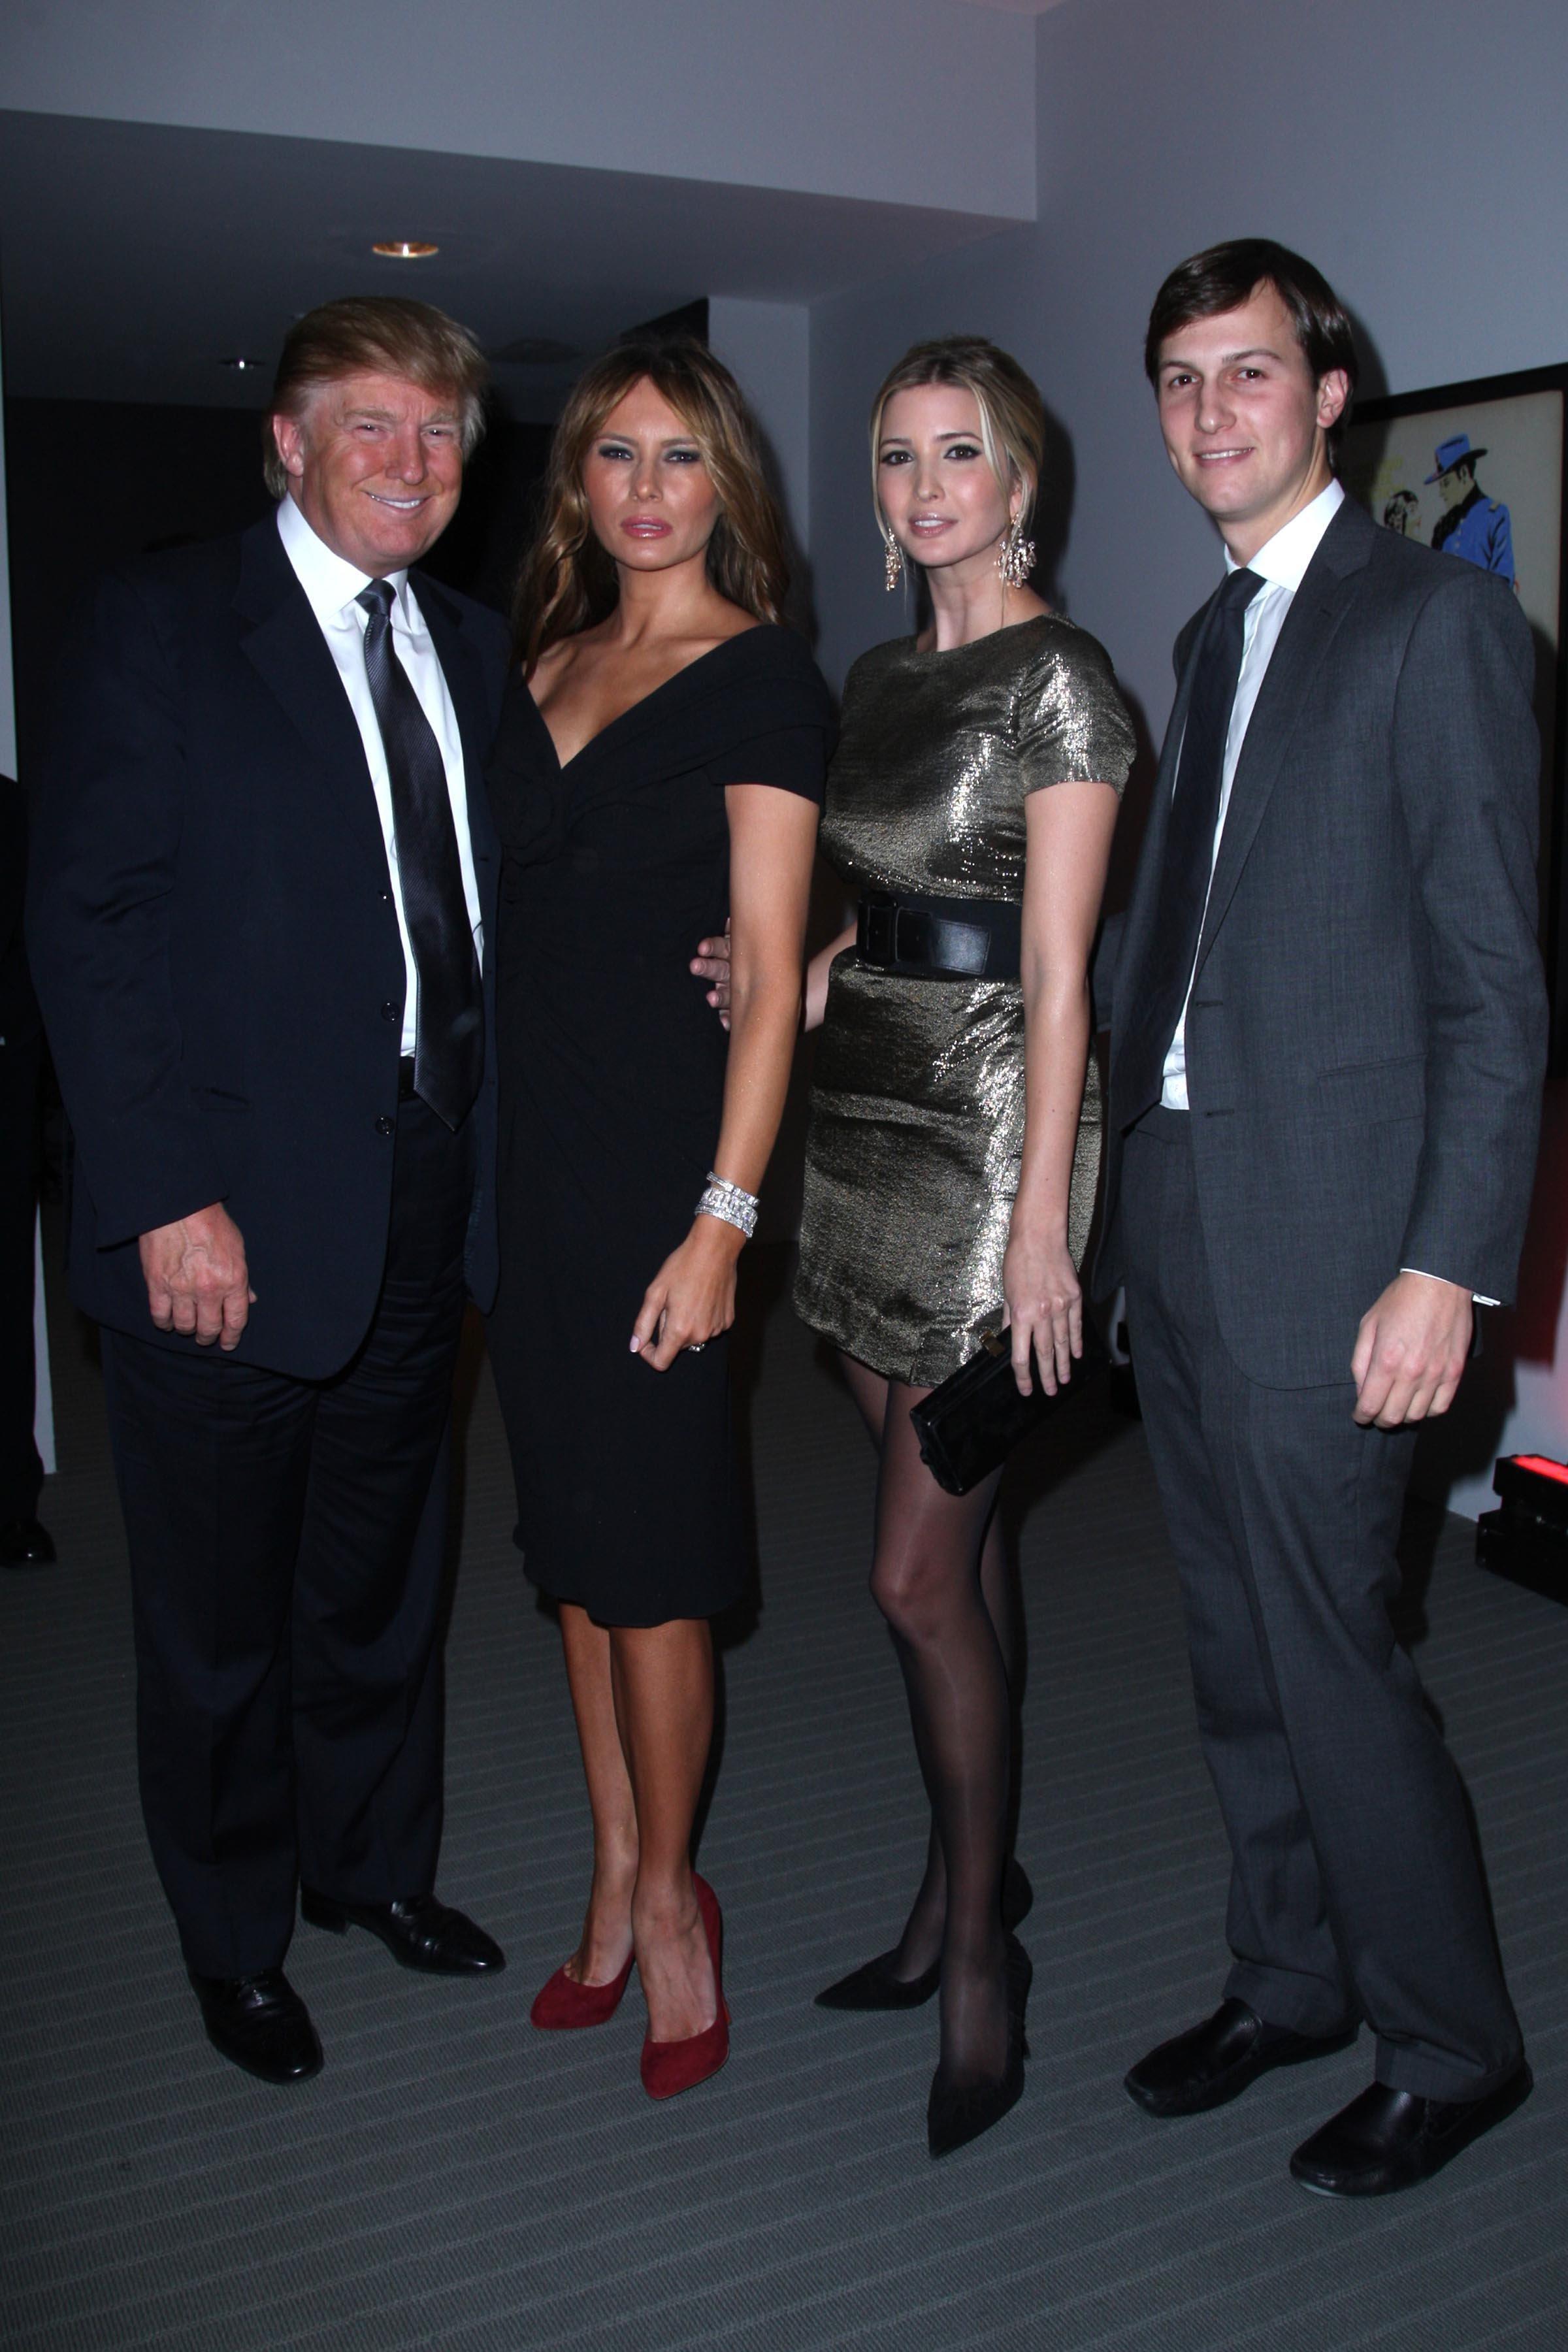 Donald Trump, Melania Trump, Ivanka Trump and Jared Kushner at the Museum of Modern Art on Nov. 10, 2008 in New York City.